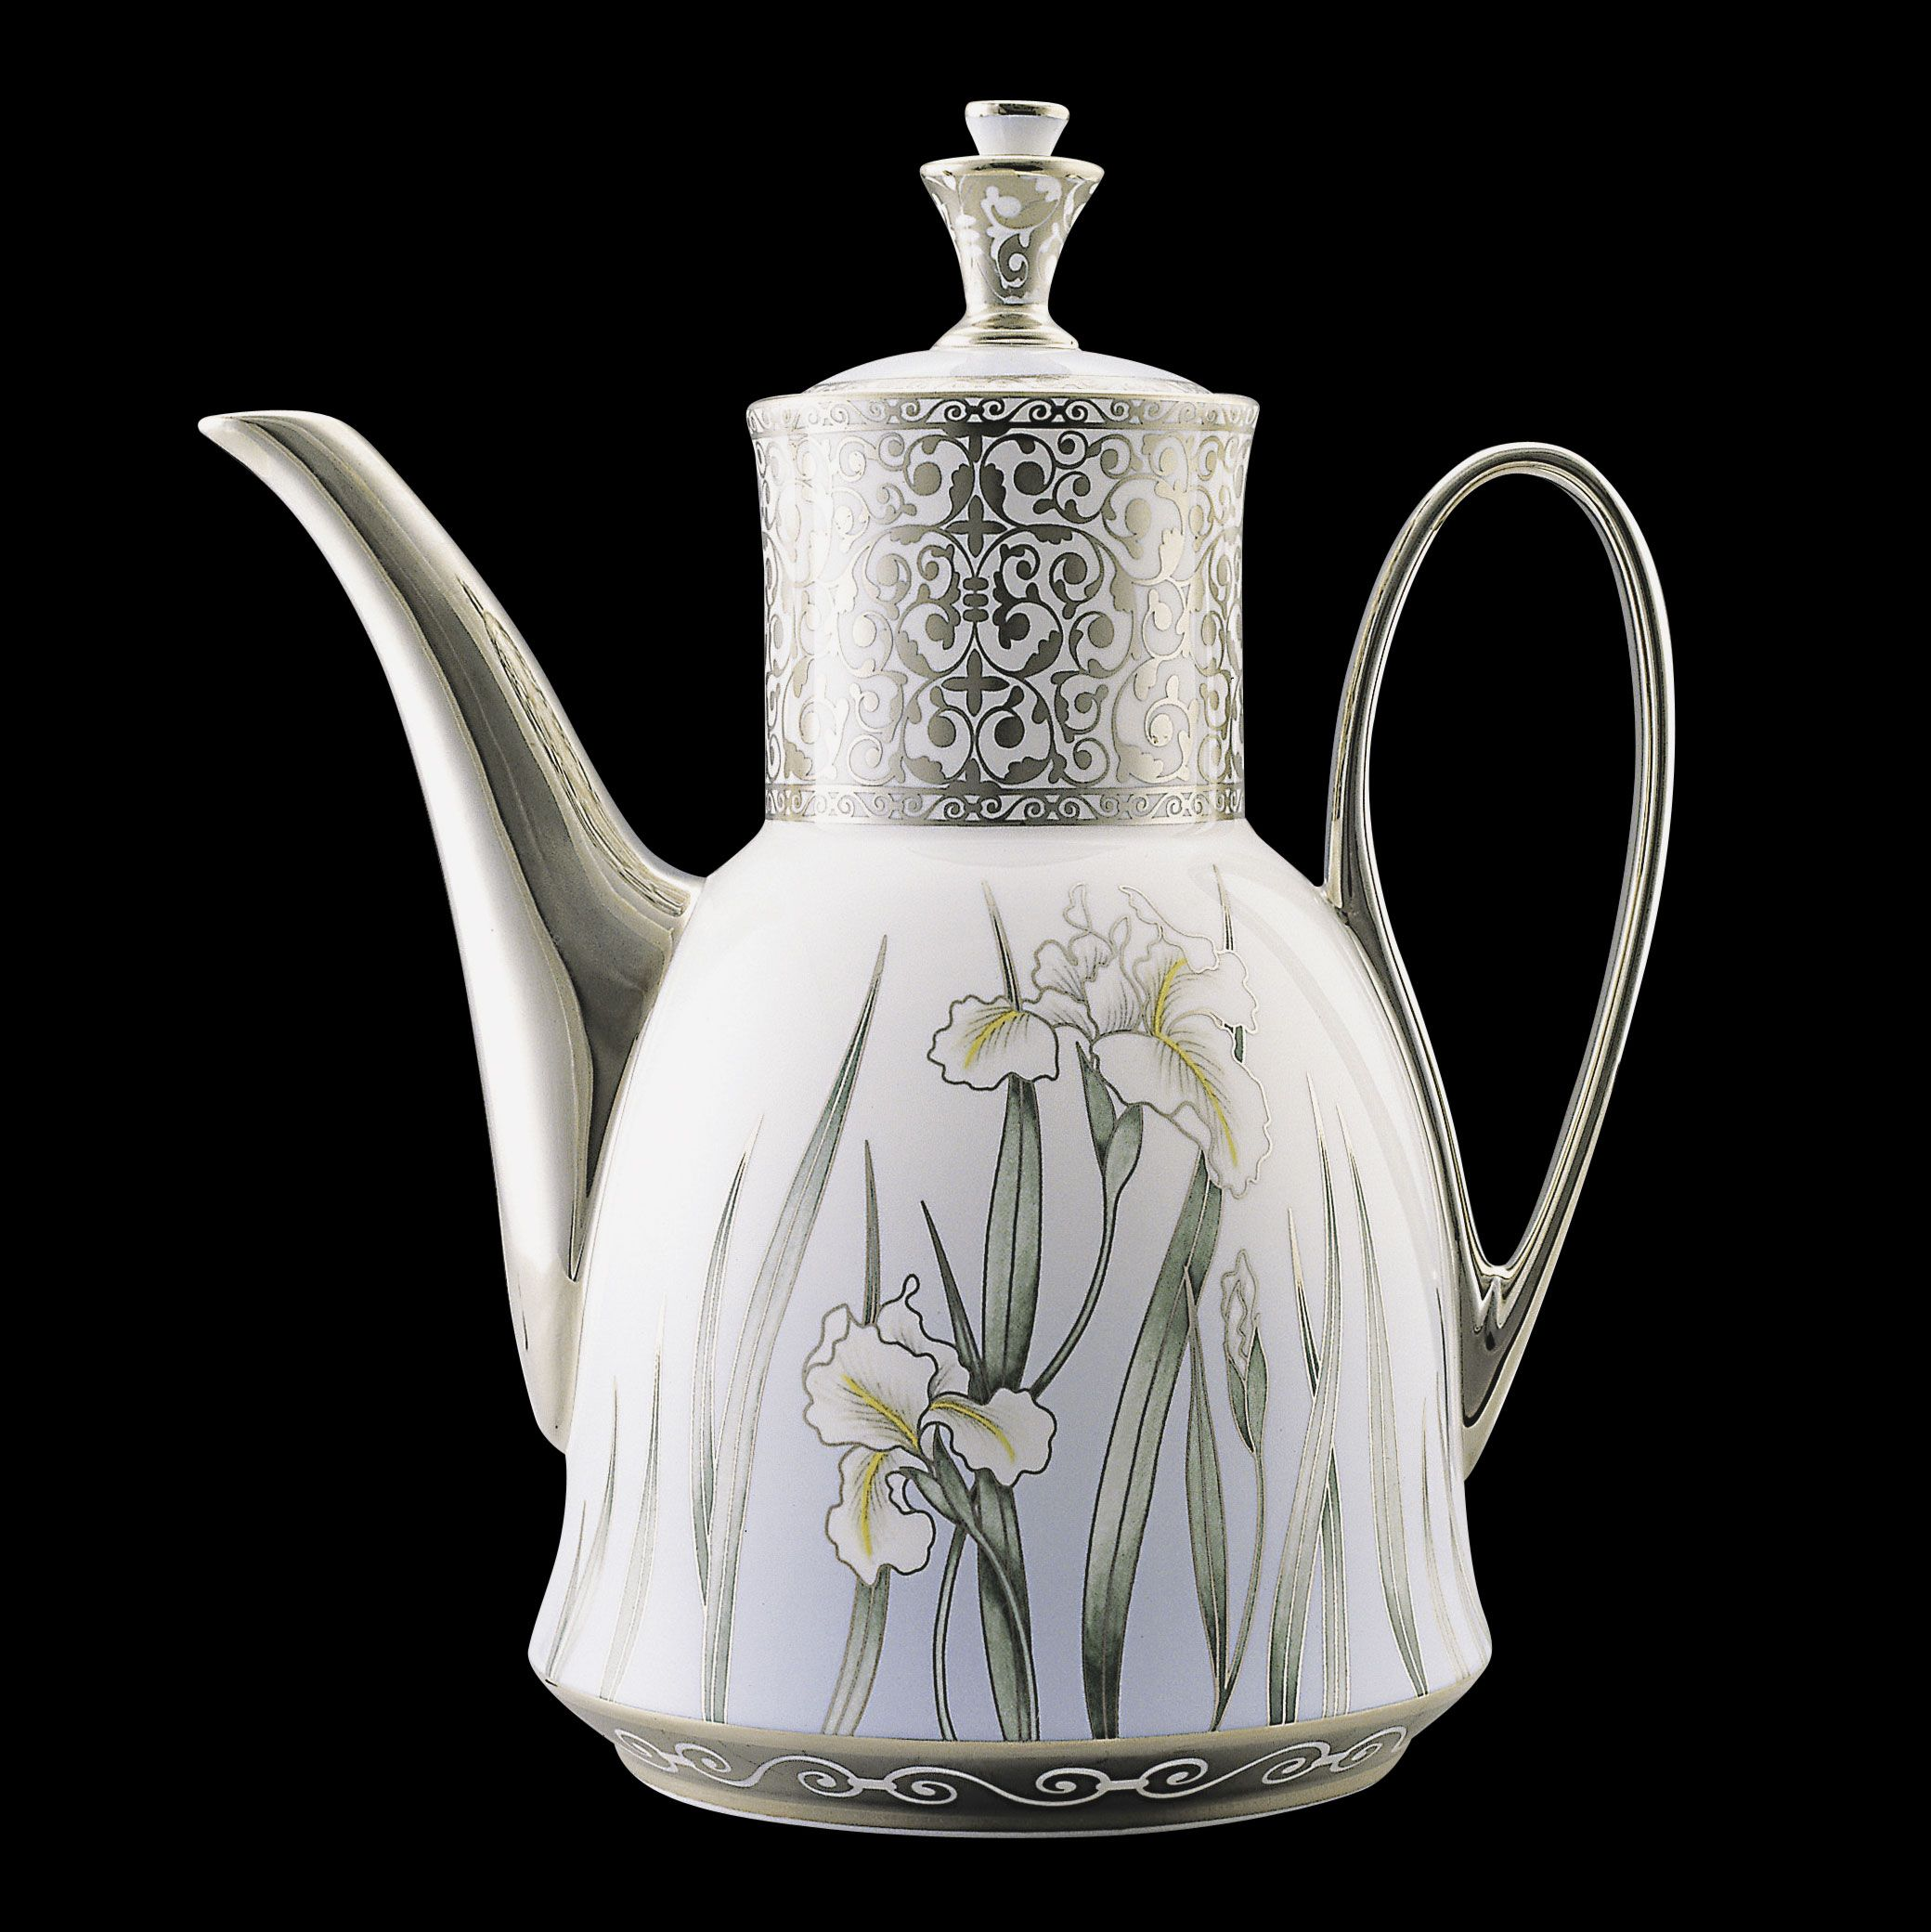 ProunaUSA  Classic  Coffeepot  Coffee pot, Branding shop, Tea pots